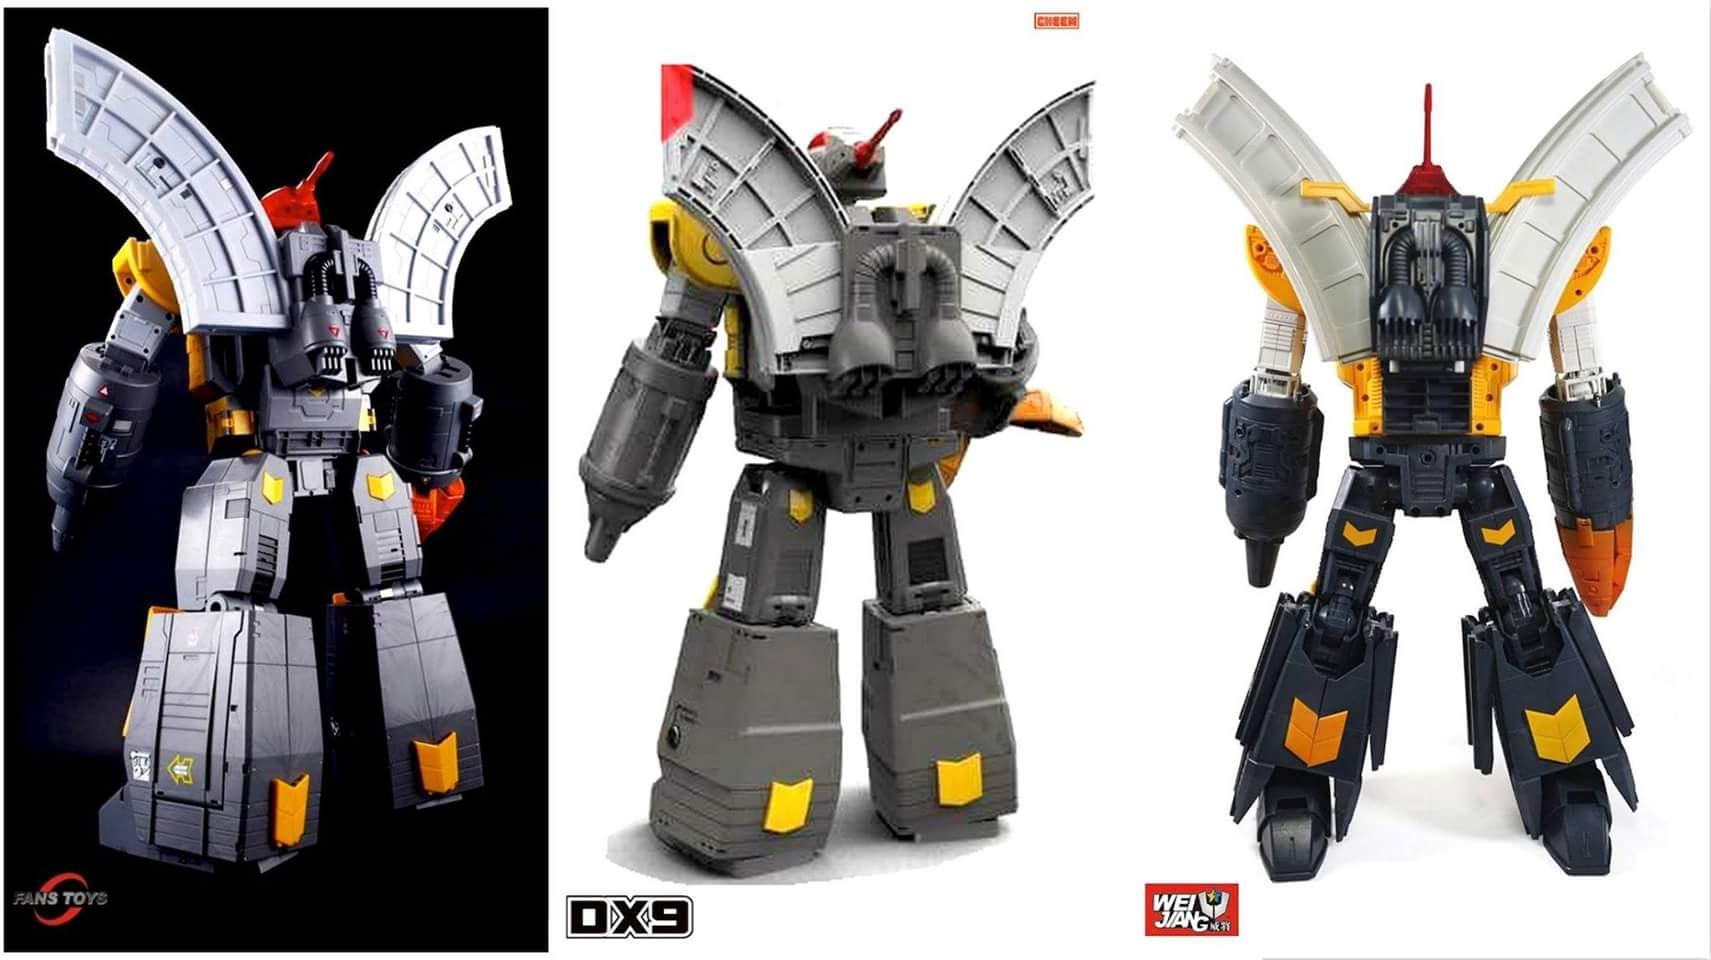 Masterpiece G1 - KO/Bootleg/Knockoff Transformers - Nouveautés, Questions, Réponses - Page 14 IkTbmN17_o